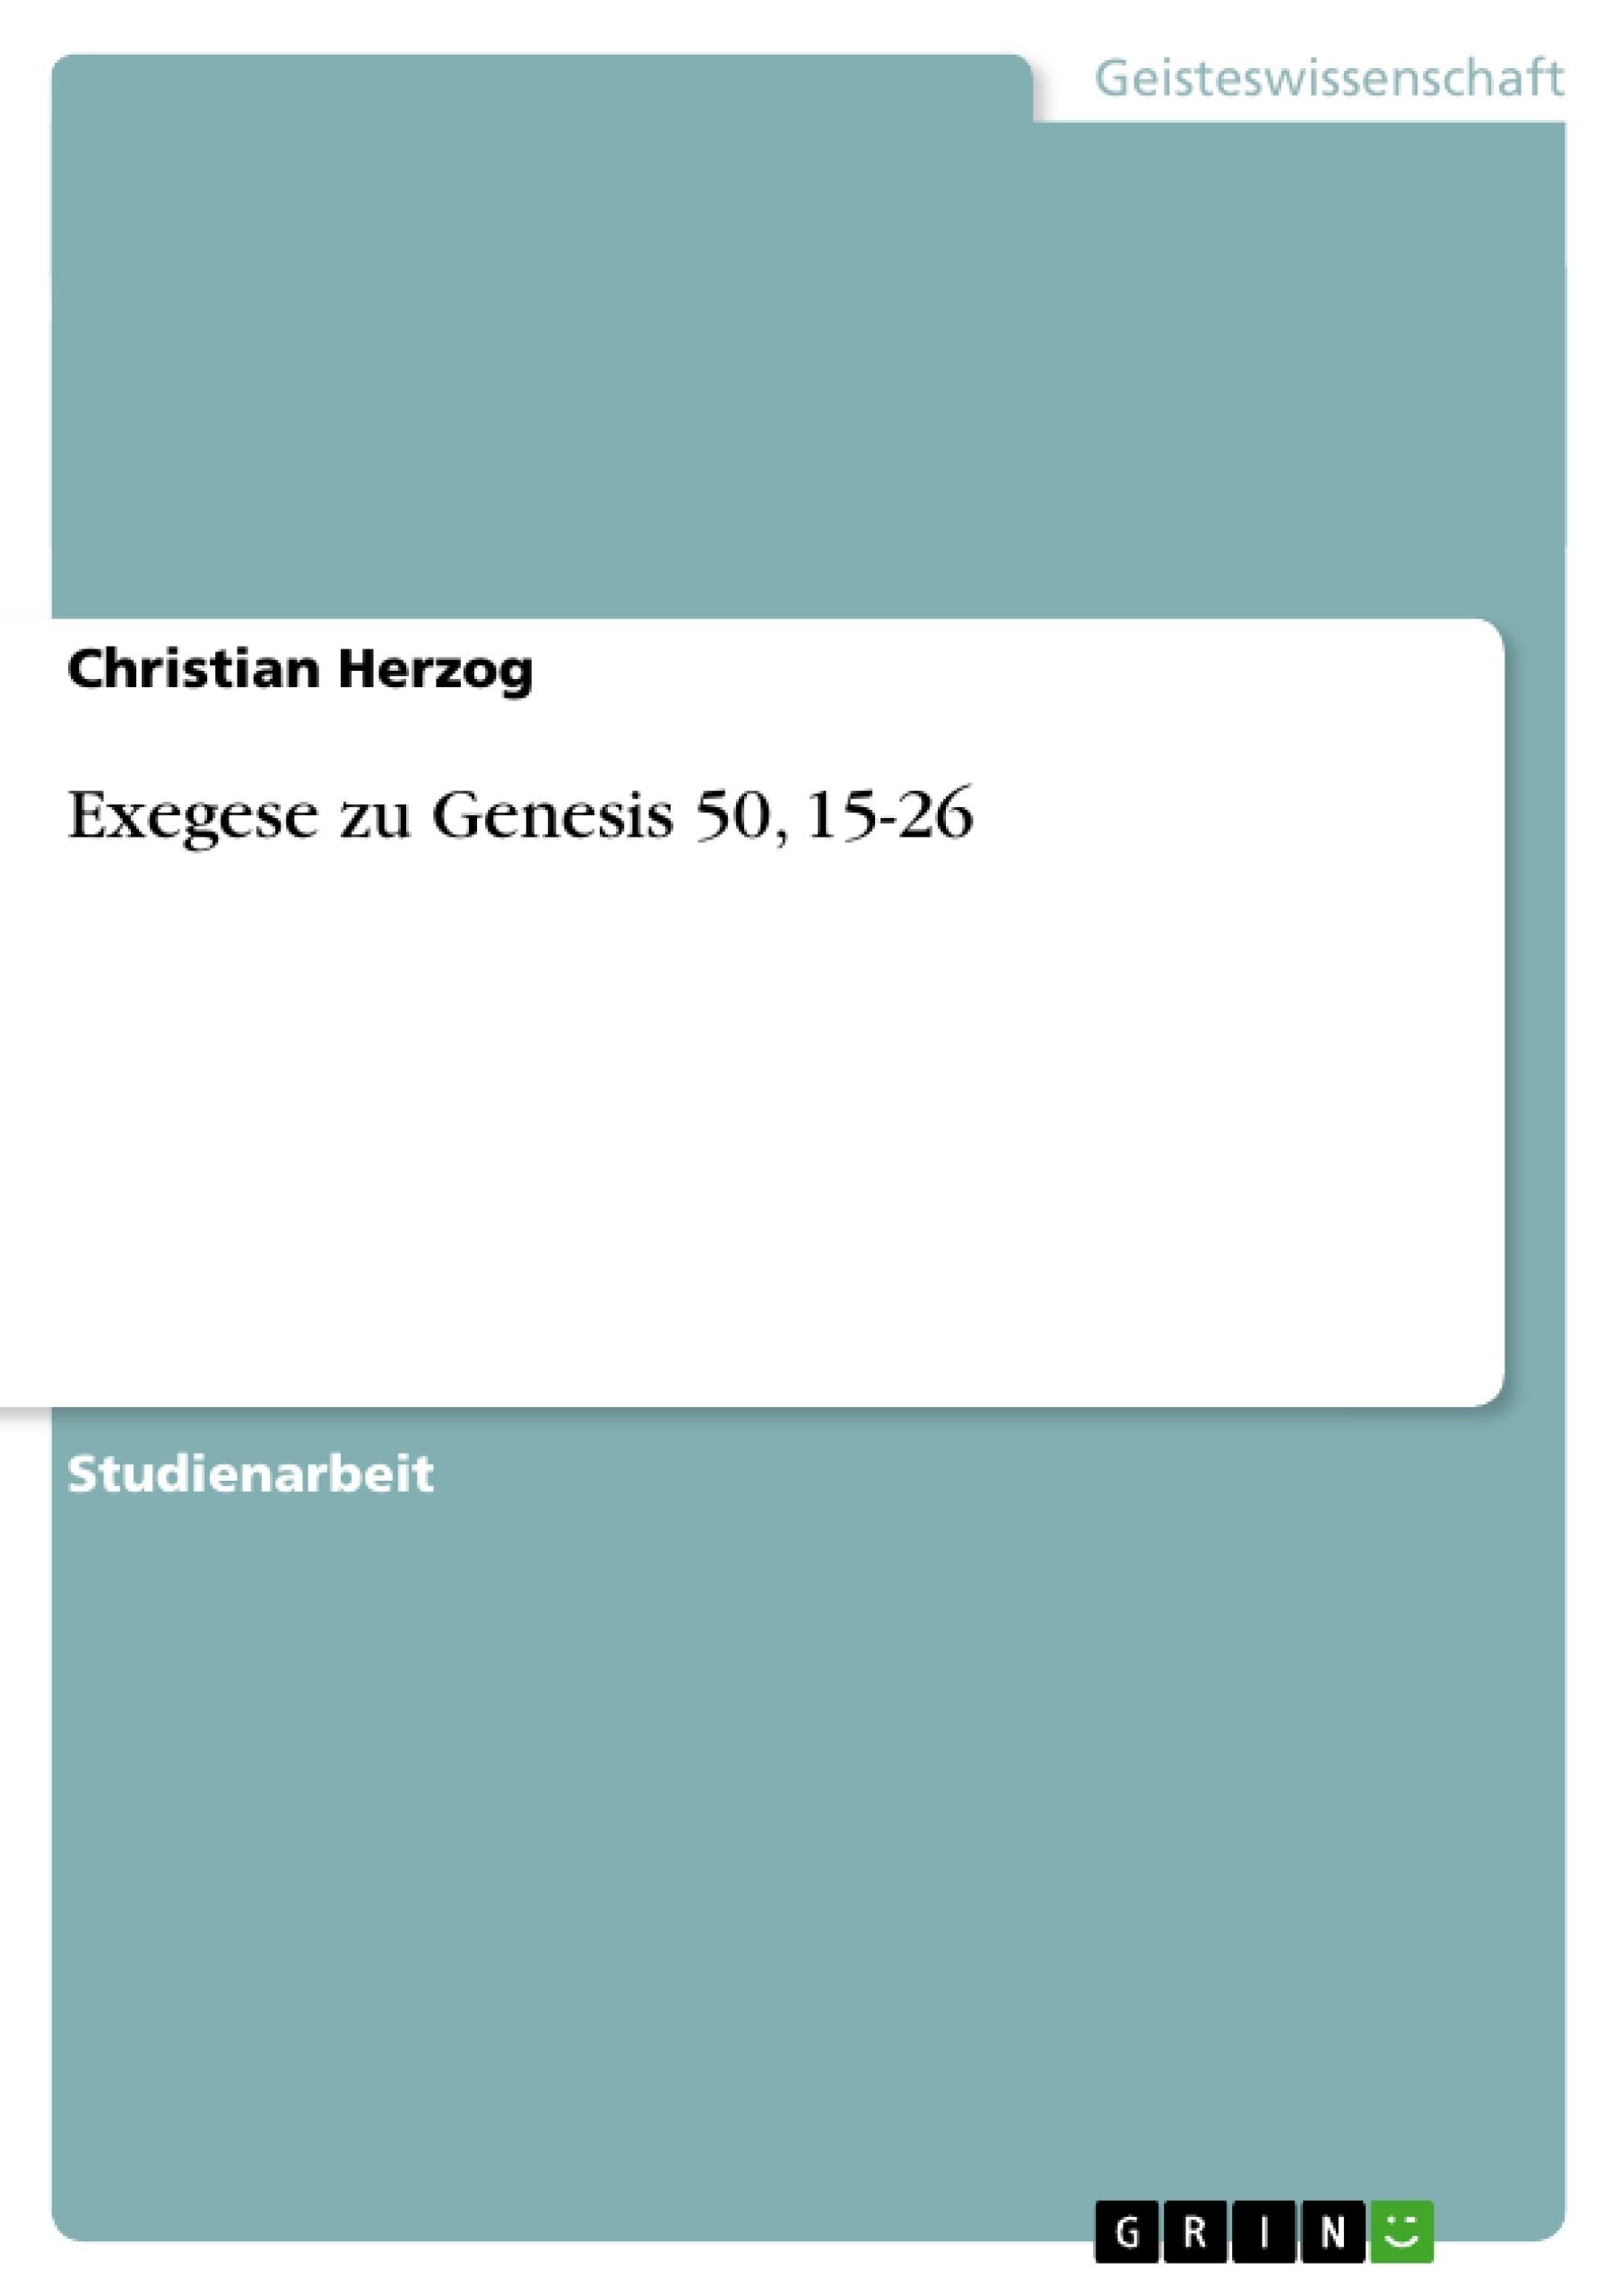 Titel: Exegese zu Genesis 50, 15-26